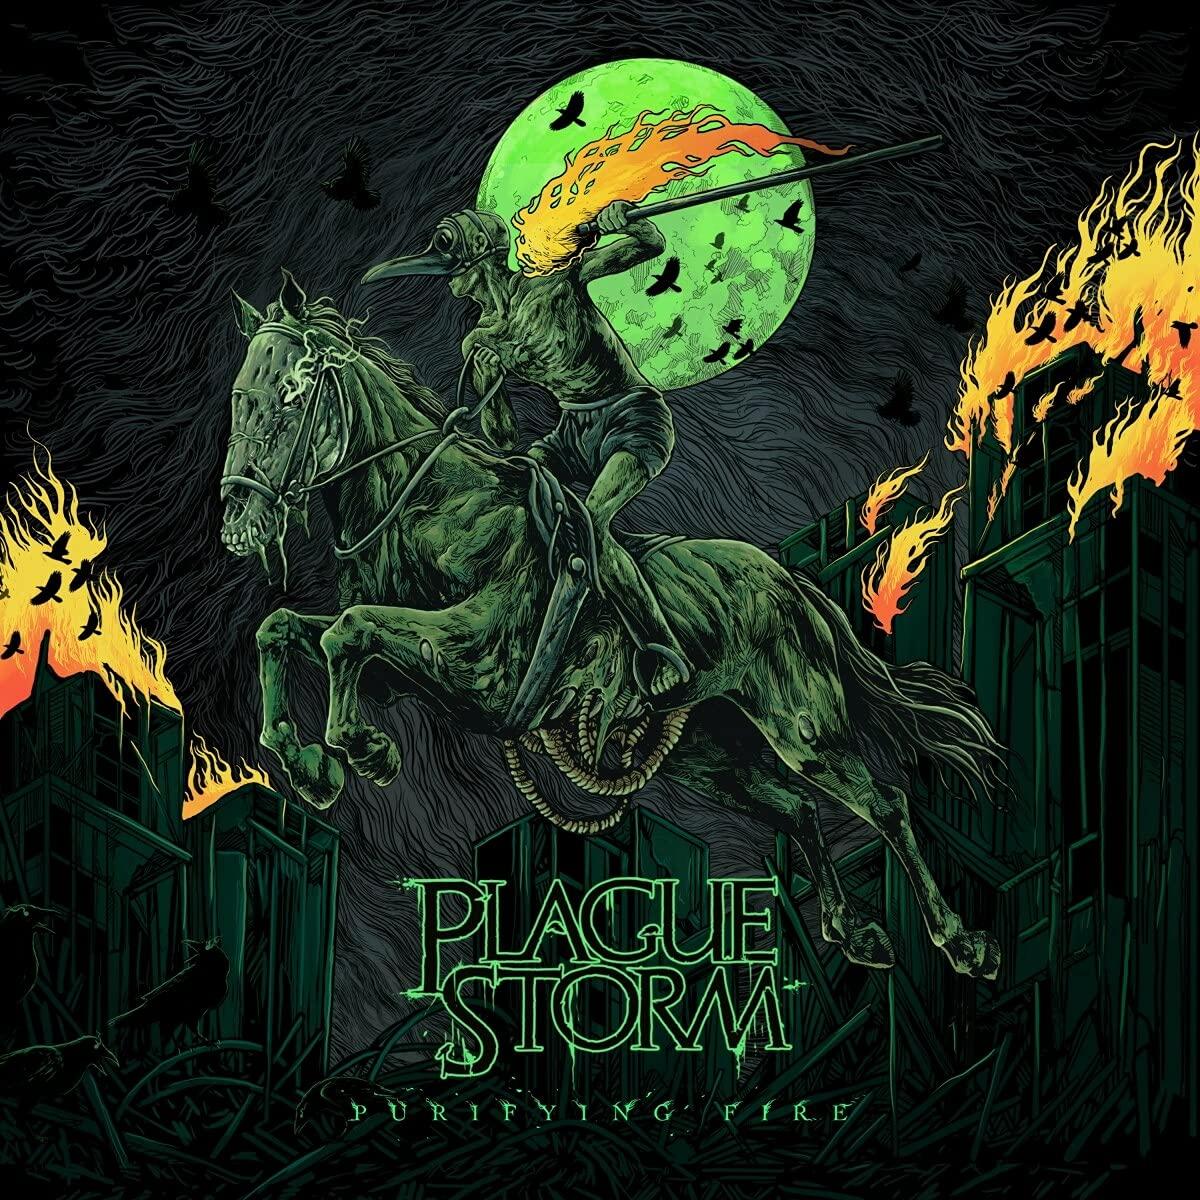 Plaguestorm – Purifying Fire (2021) [FLAC]